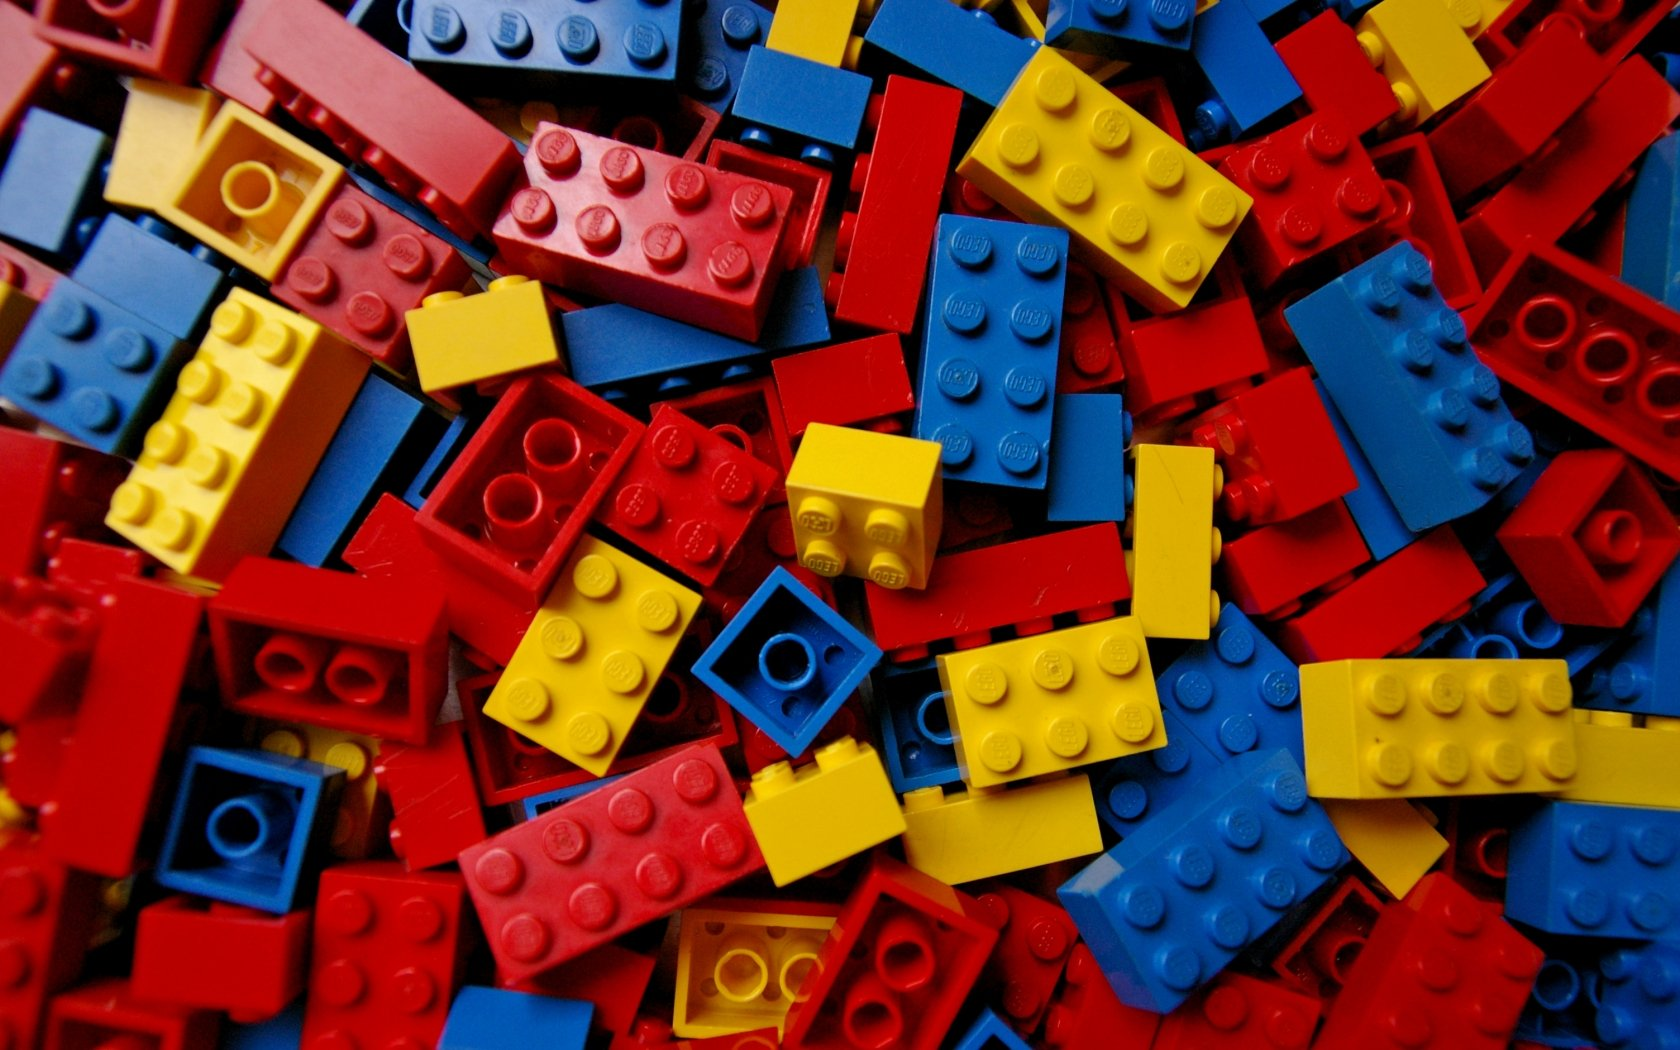 GALLERY Lego Bricks Wallpaper 1680x1050